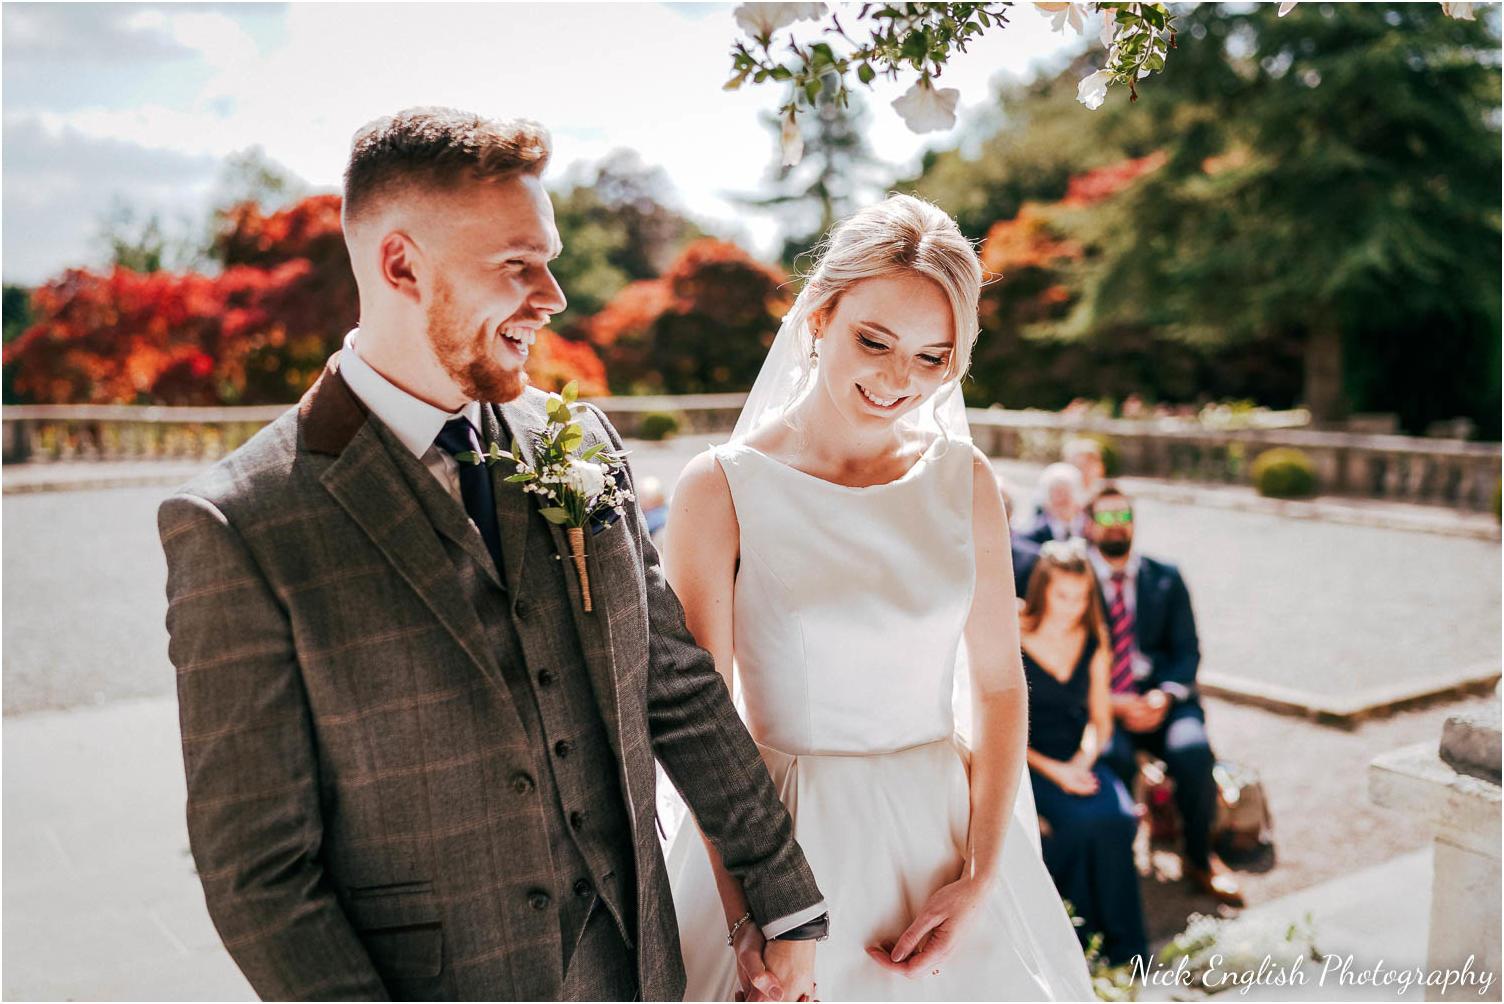 Eaves_Hall_Outdoor_Wedding_Photograph-34.jpg